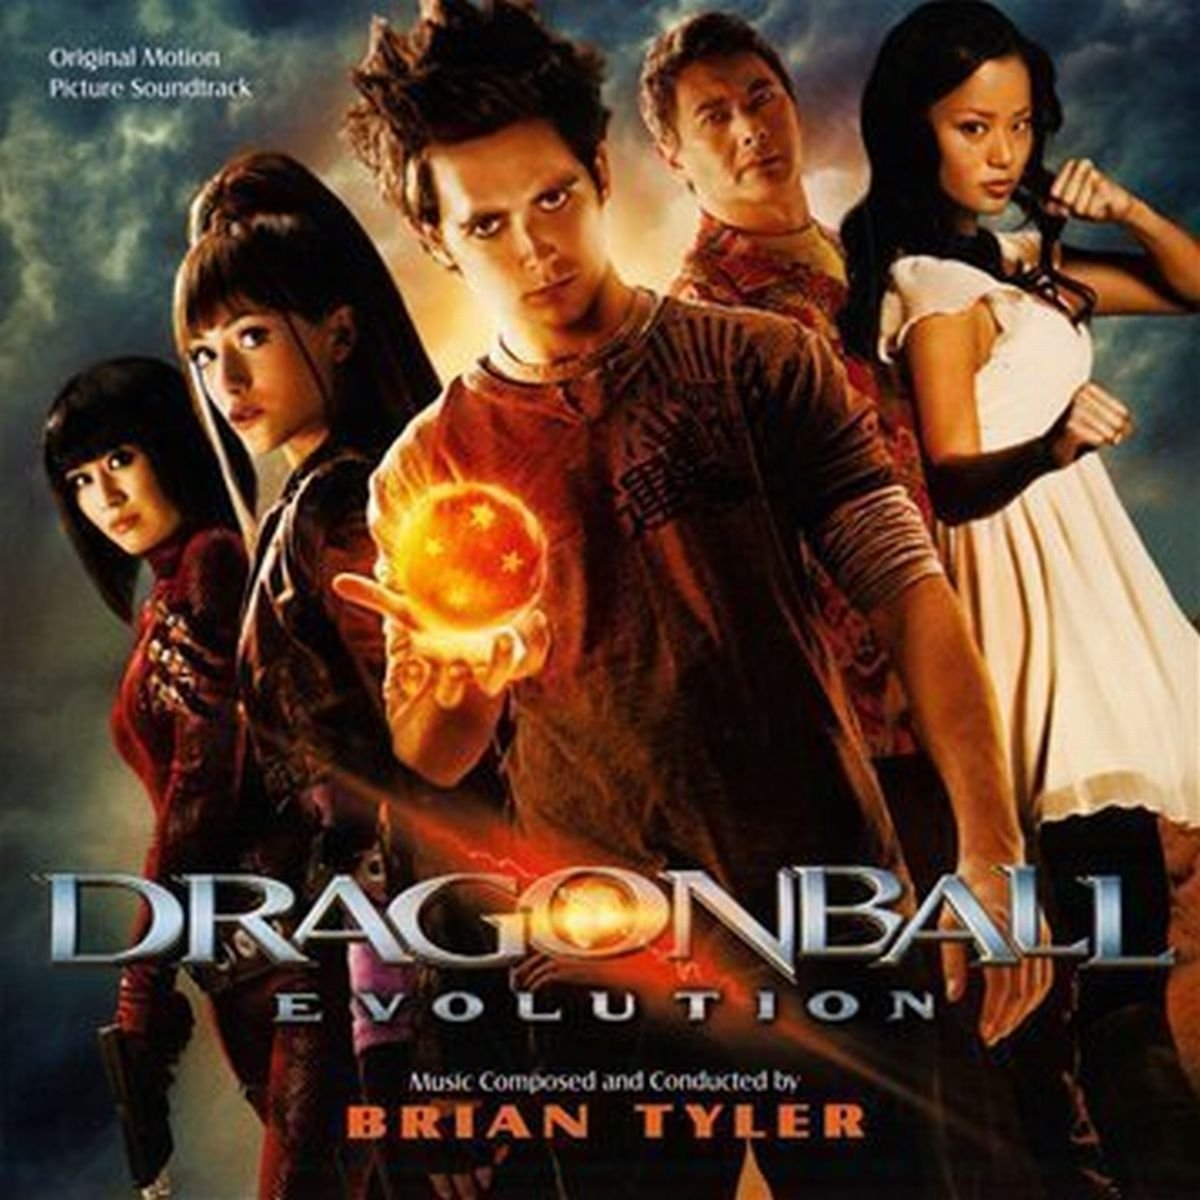 bande originale soundrack ost score dragonball evolution disney fox